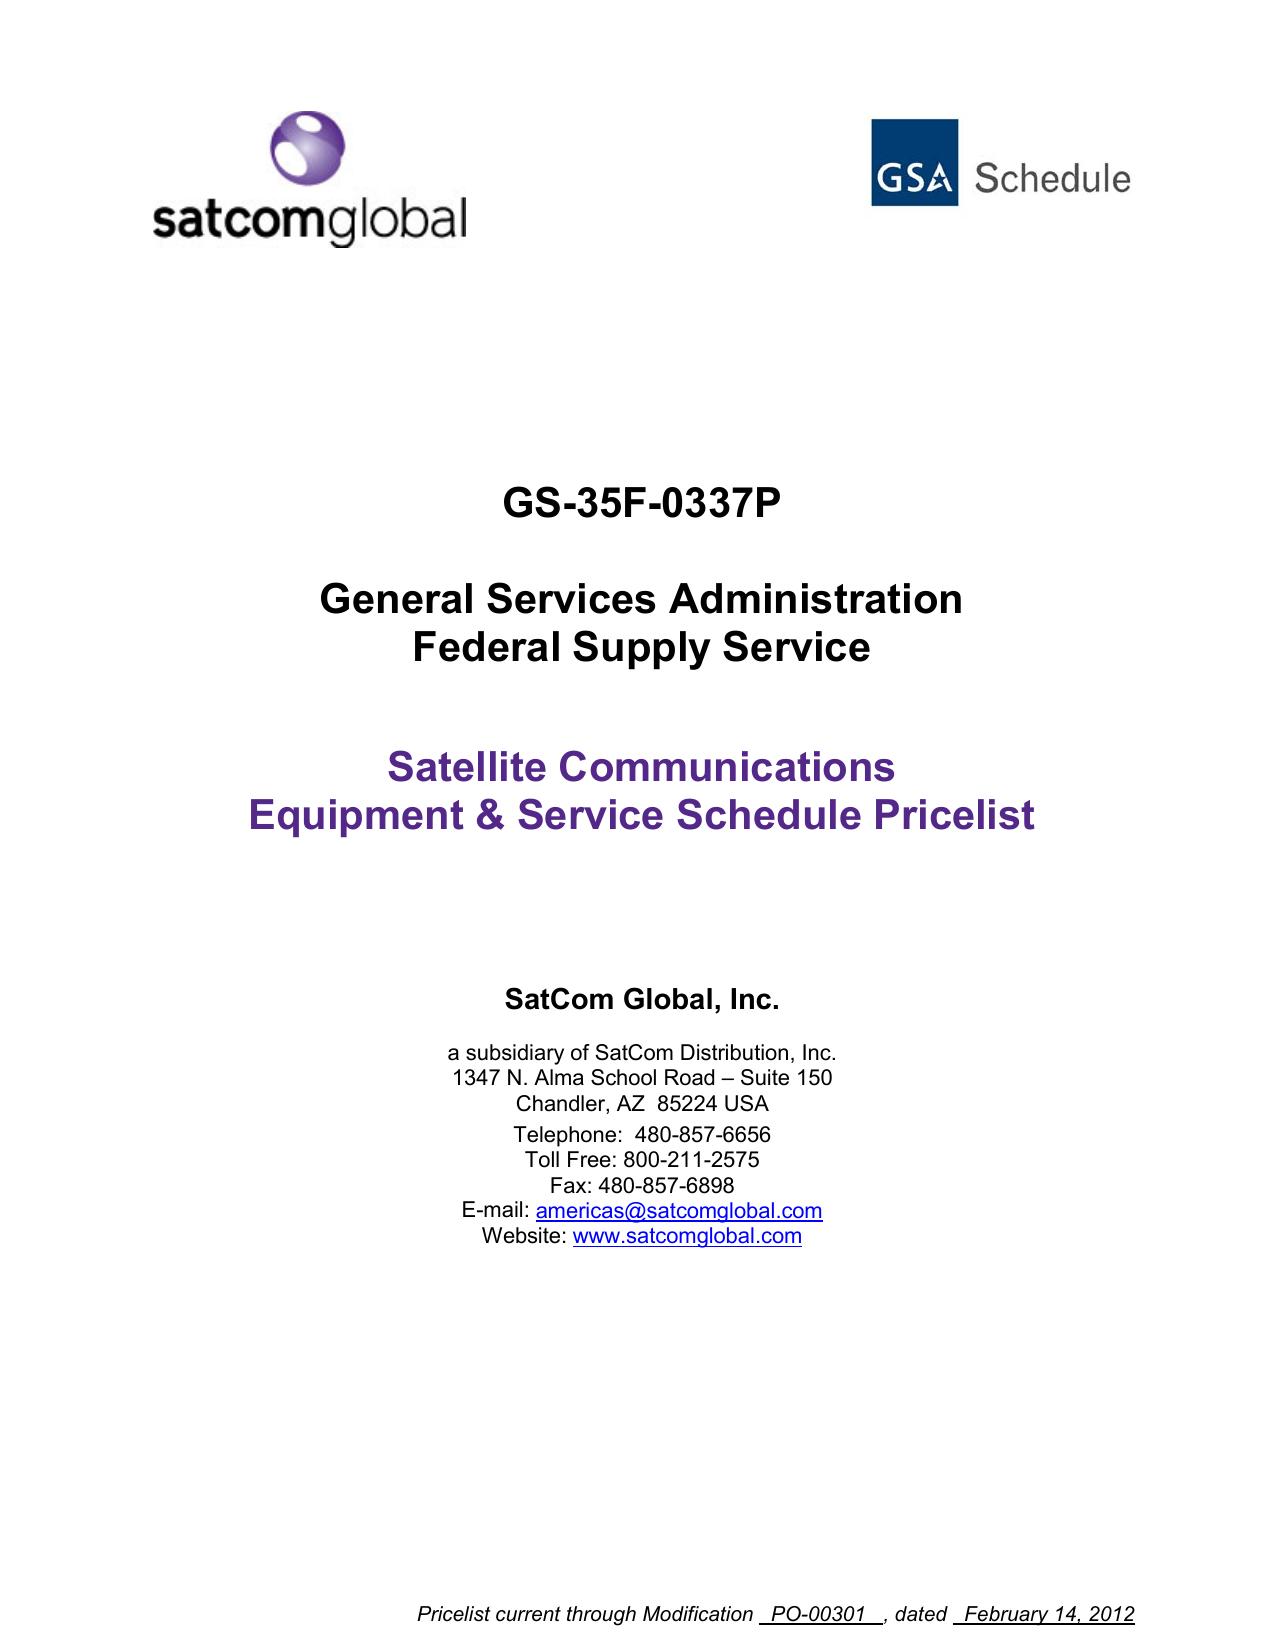 GSA Pricing Schedule Comments/Questions | manualzz com